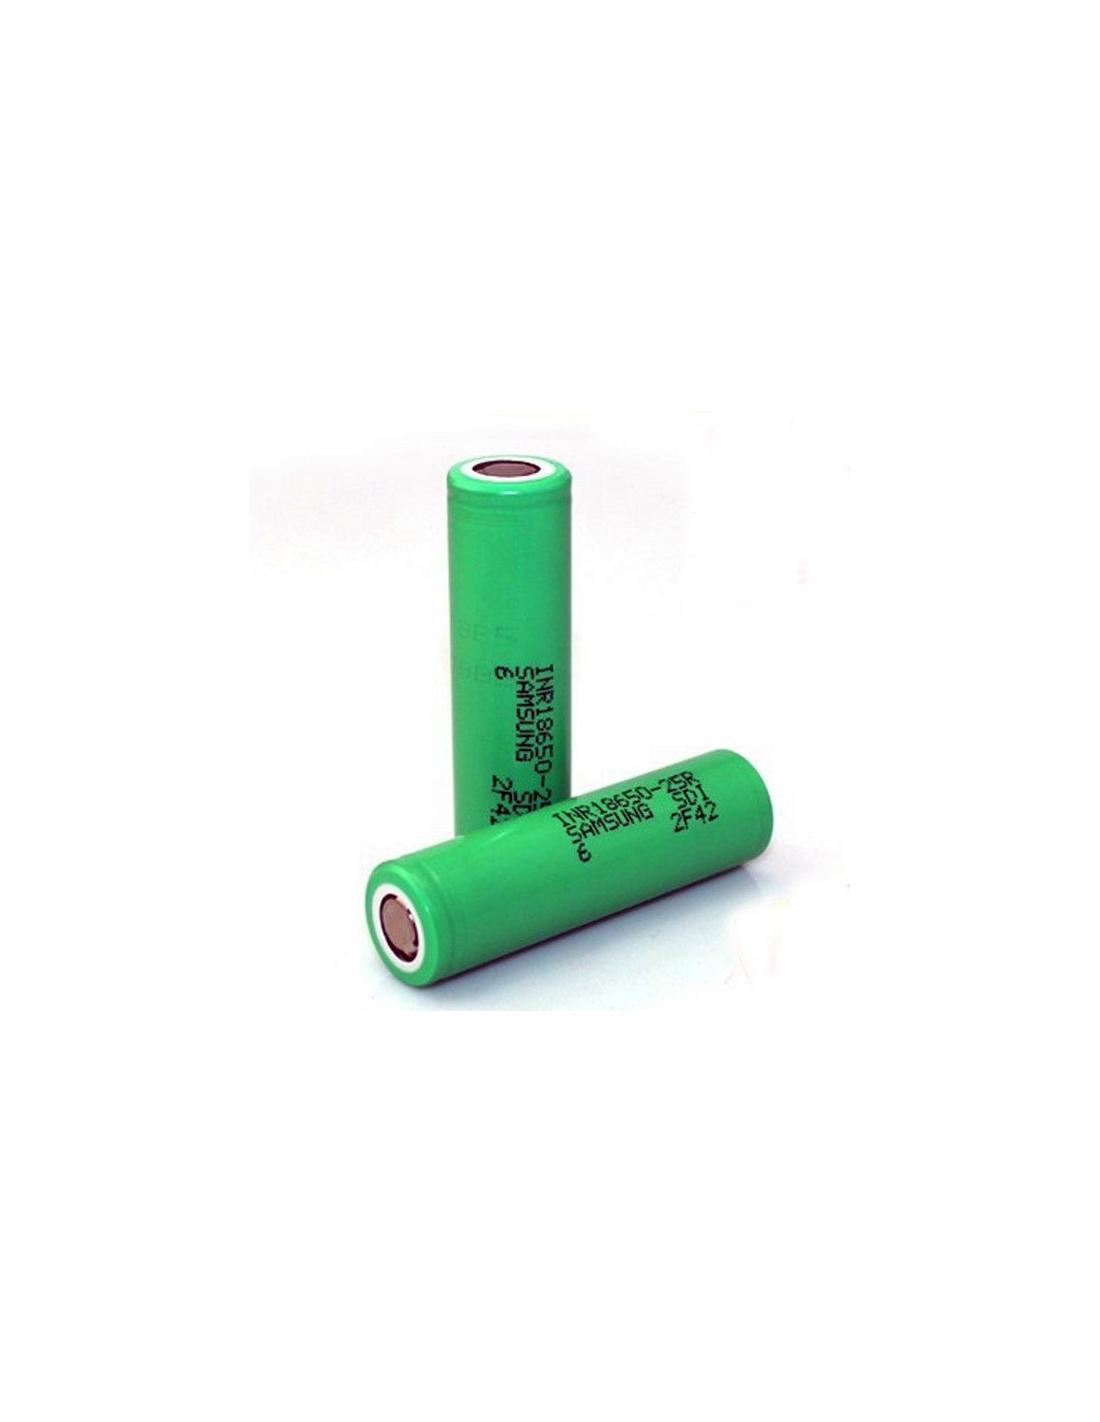 samsung 18650-25r 2500 mah 20a batteria ricaricabile